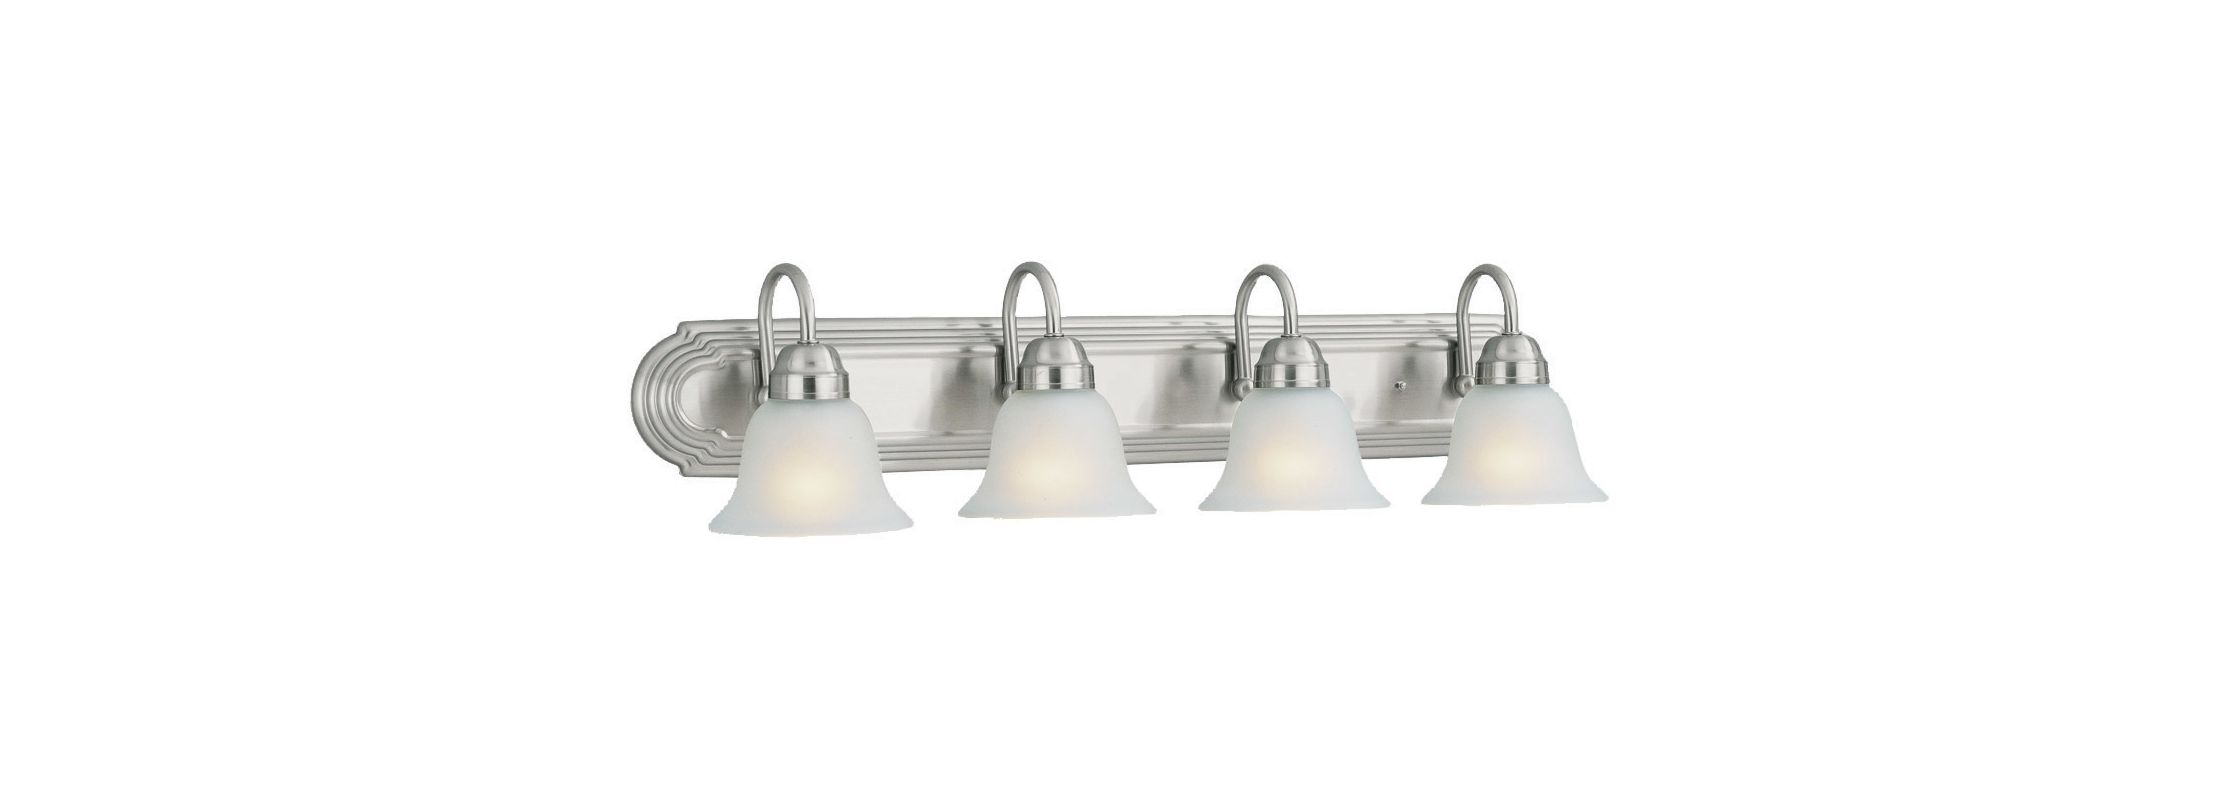 Design House 506592 Allante Traditional / Classic 4 Light Down Sale $109.47 ITEM: bci1286754 ID#:506592 UPC: 44321506599 :